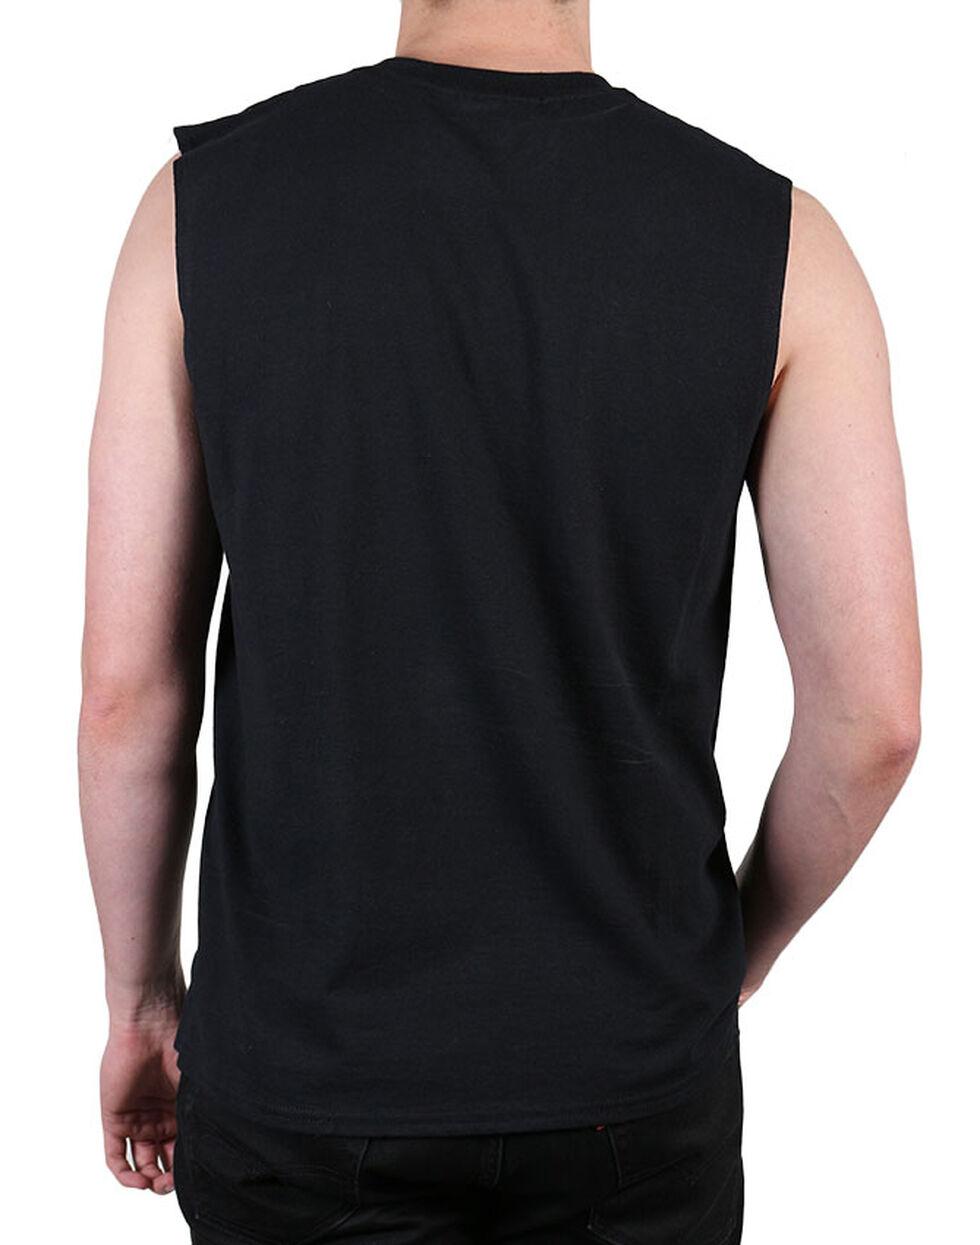 Jack Daniel's Men's Label Sleeveless Tee , Black, hi-res